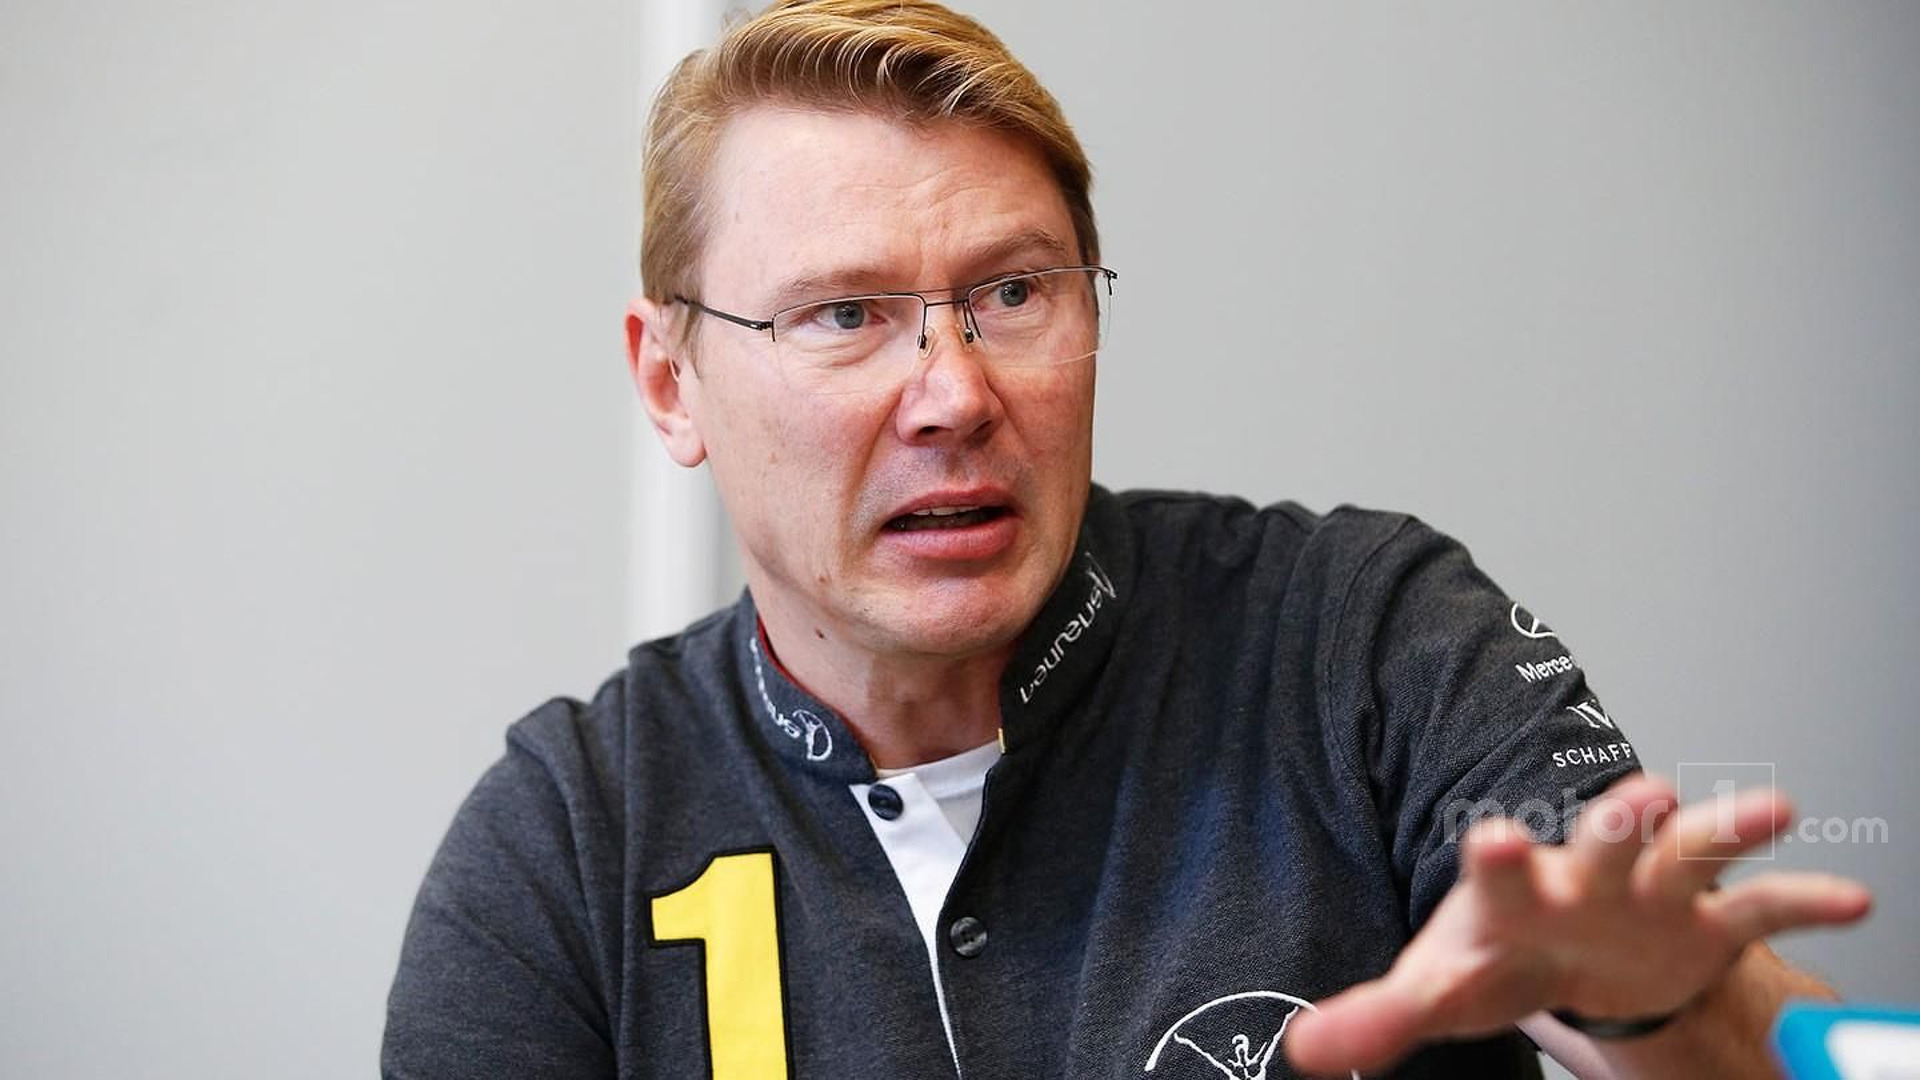 Hakkinen: I was wrong to criticise Verstappen